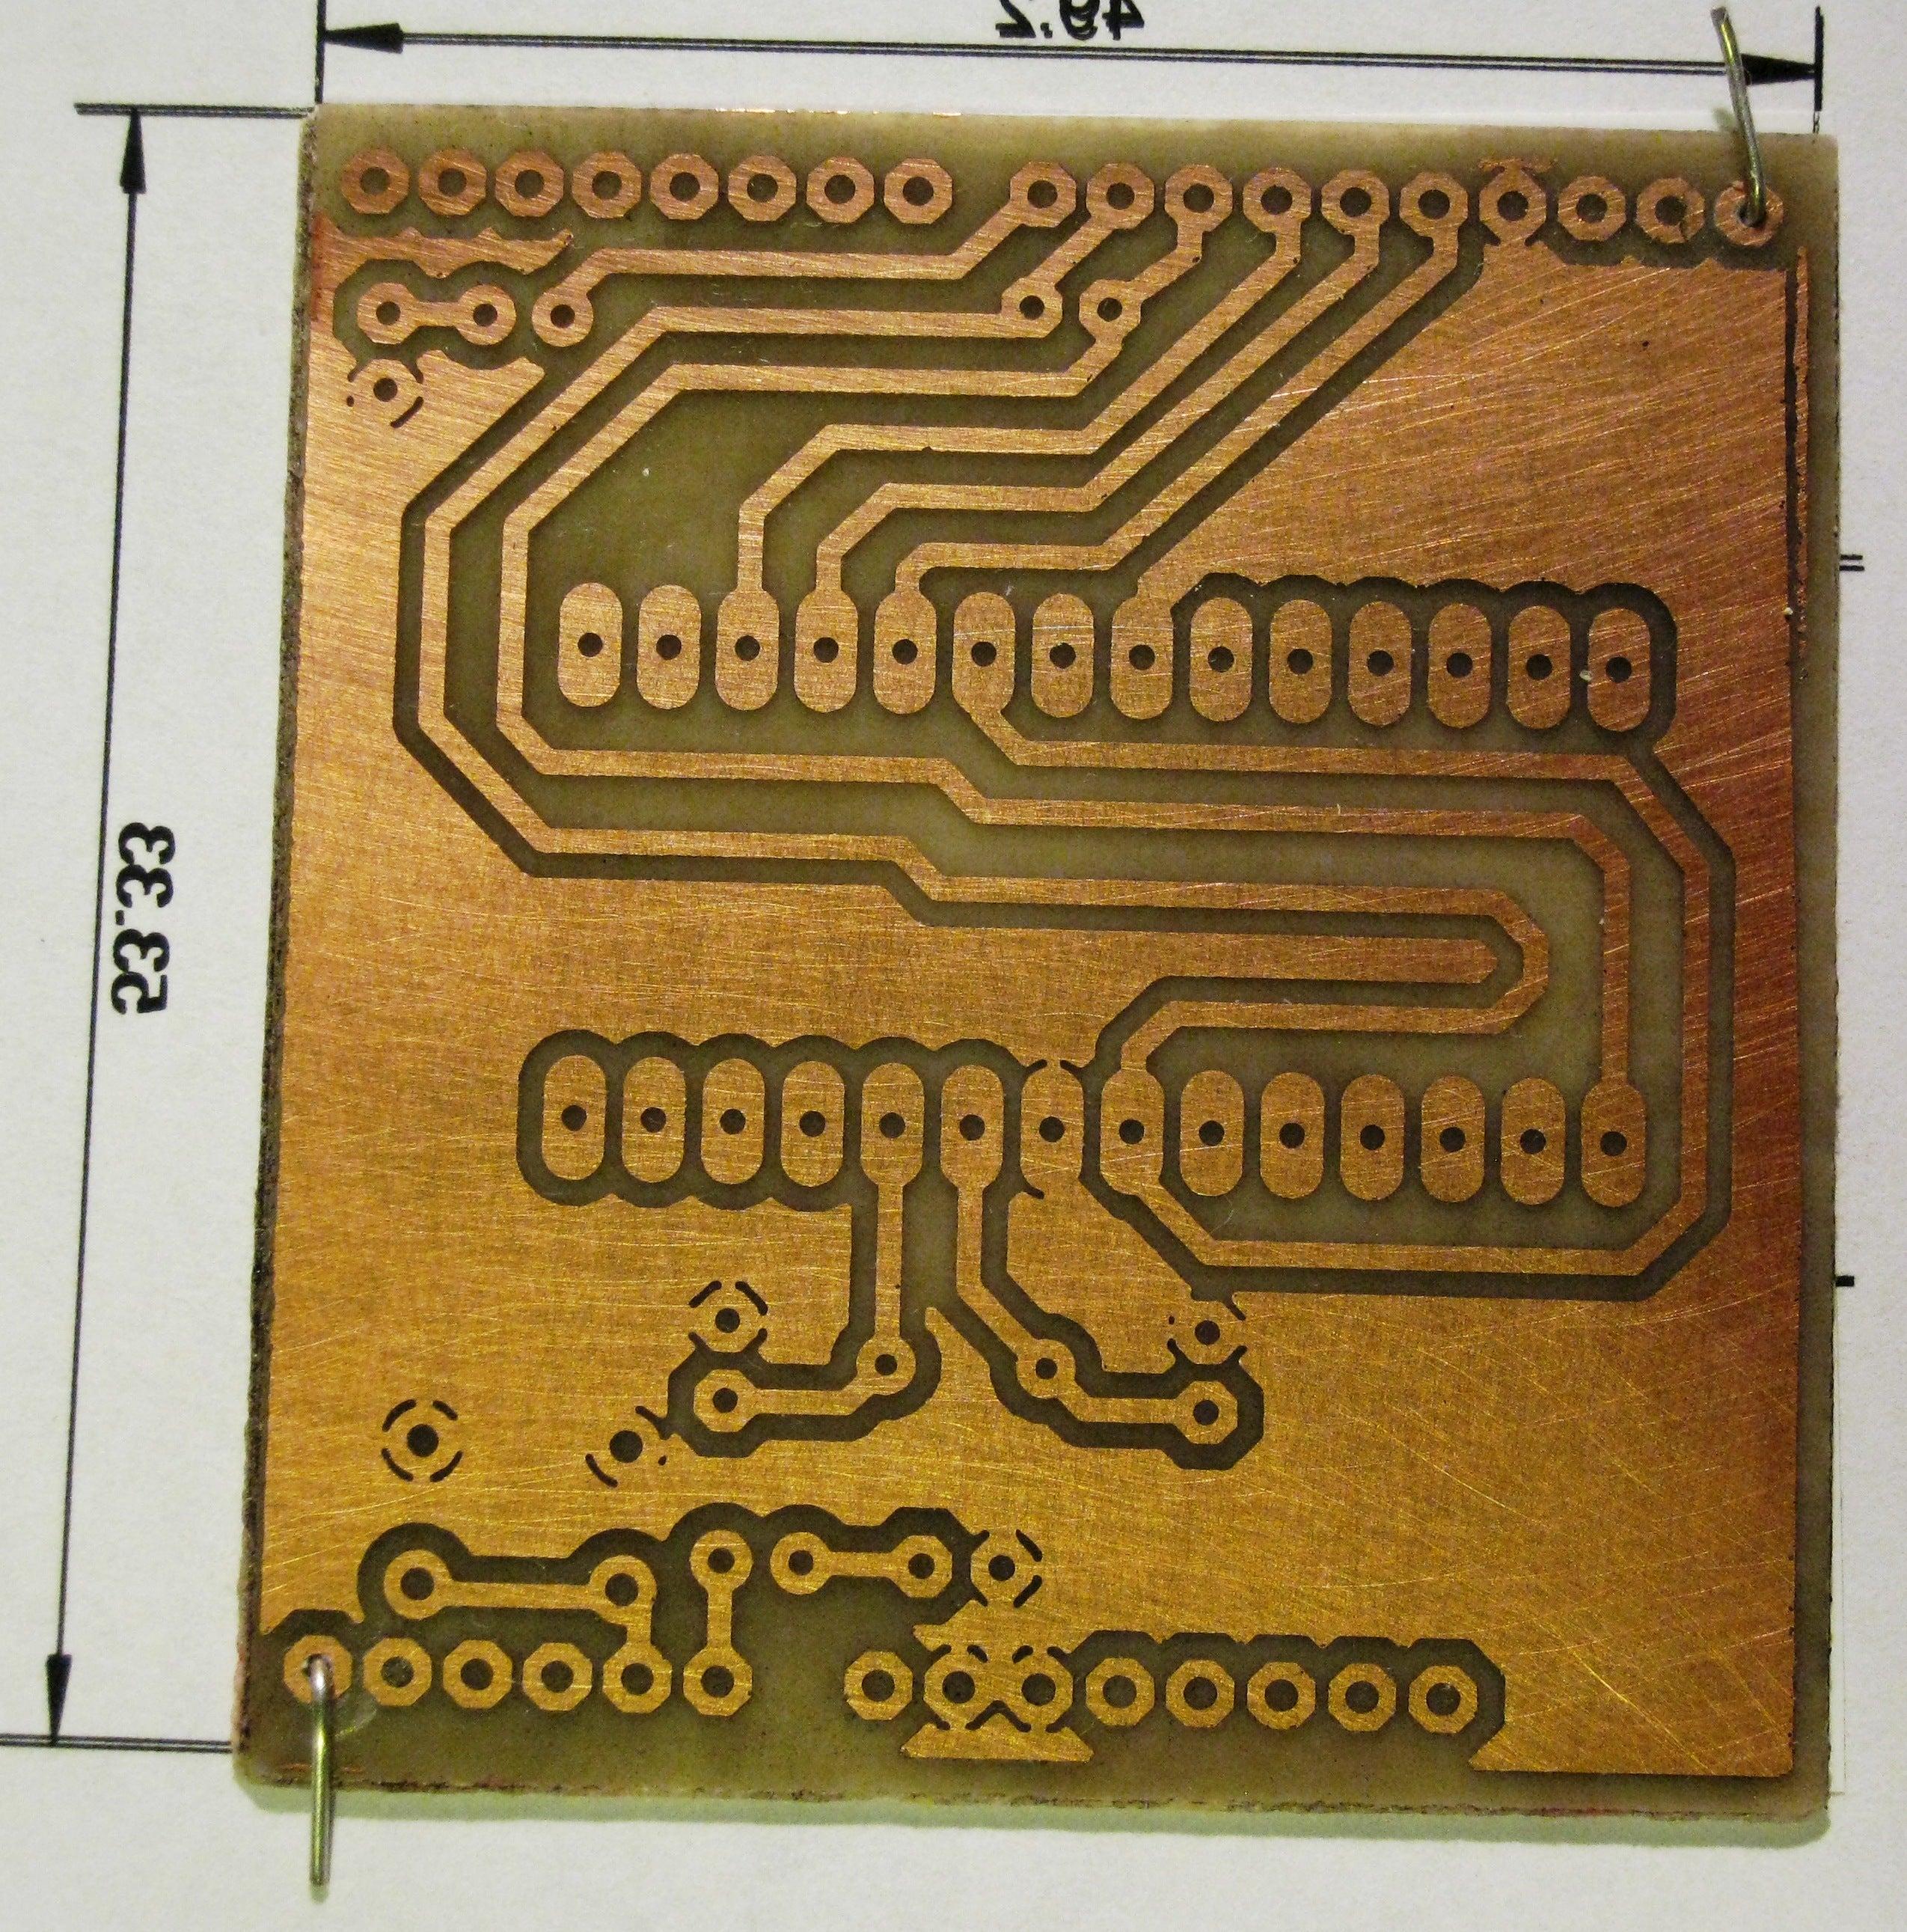 Circuit Board Sticker Vinyl Sheet Permanent